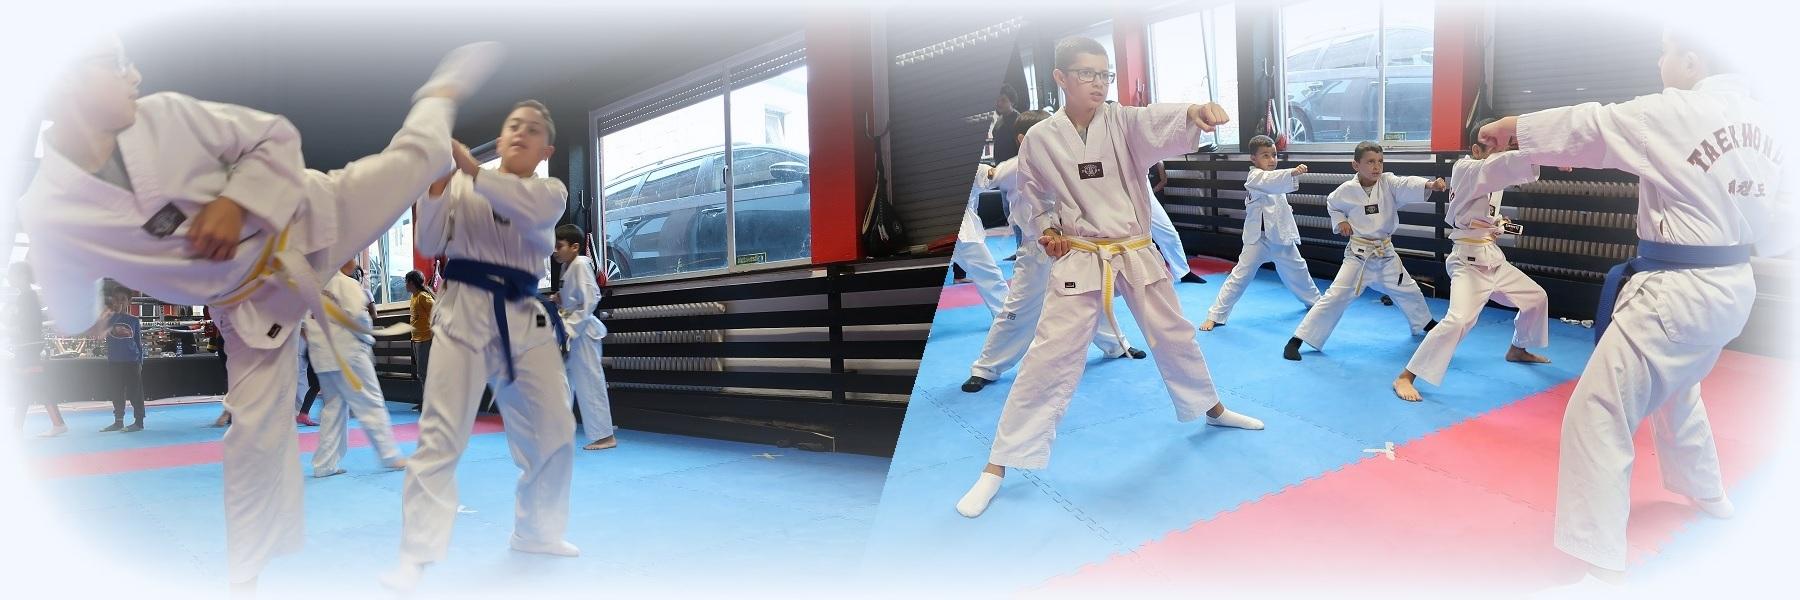 Taekwondo-KuJ-Header-3